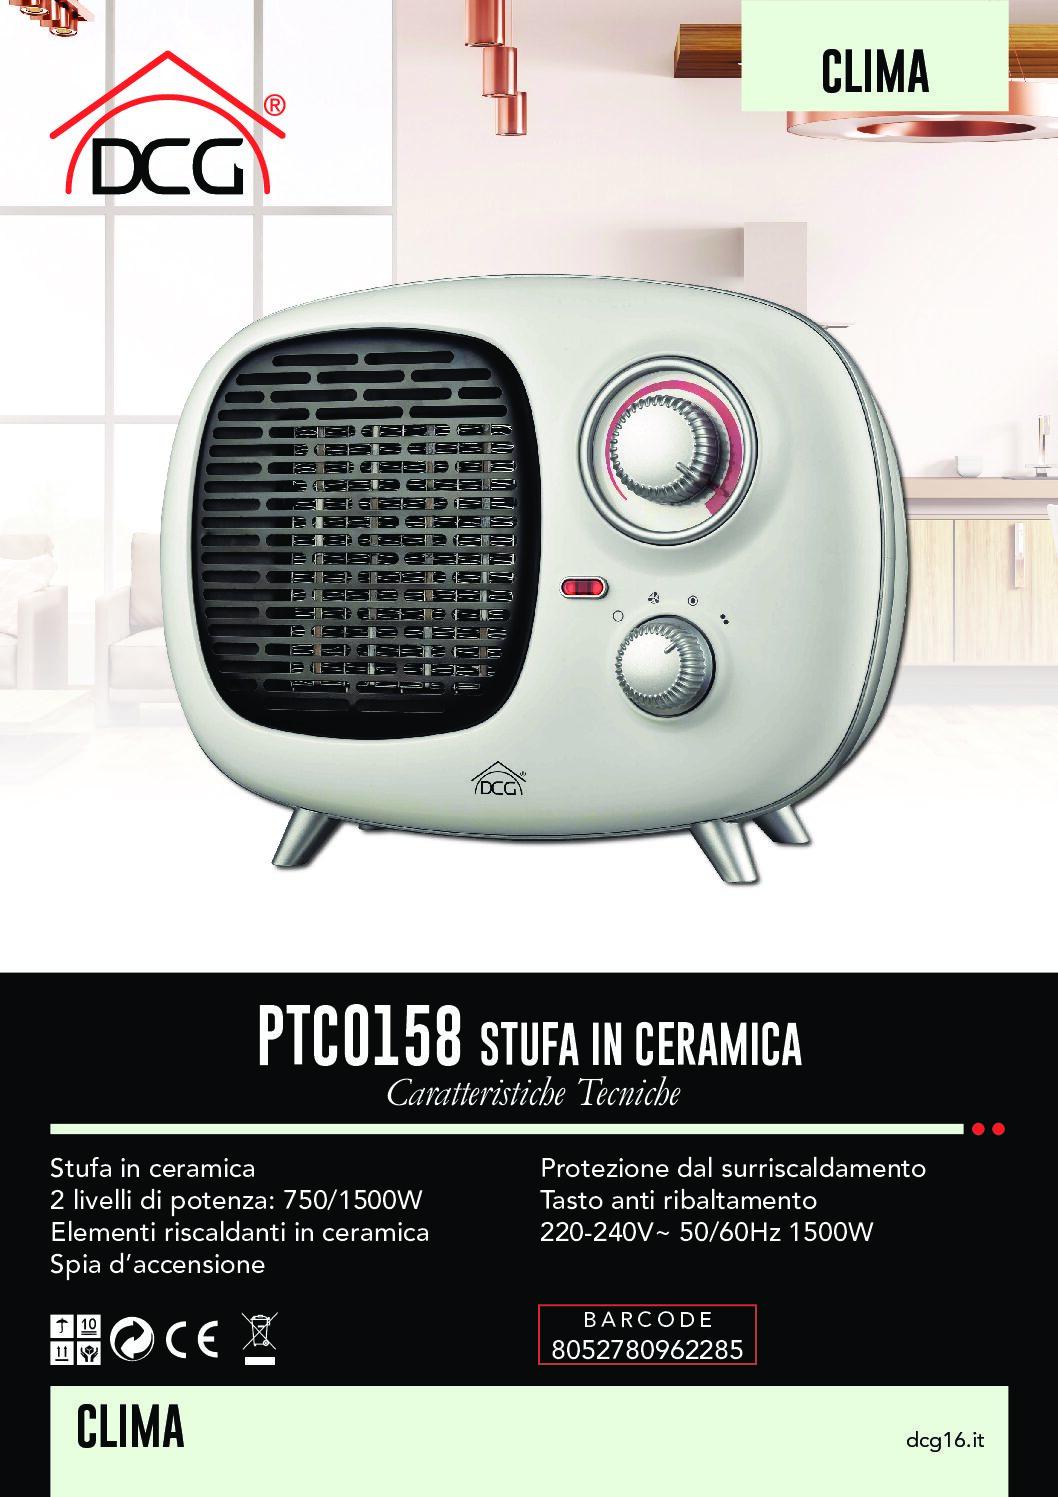 PTC0158